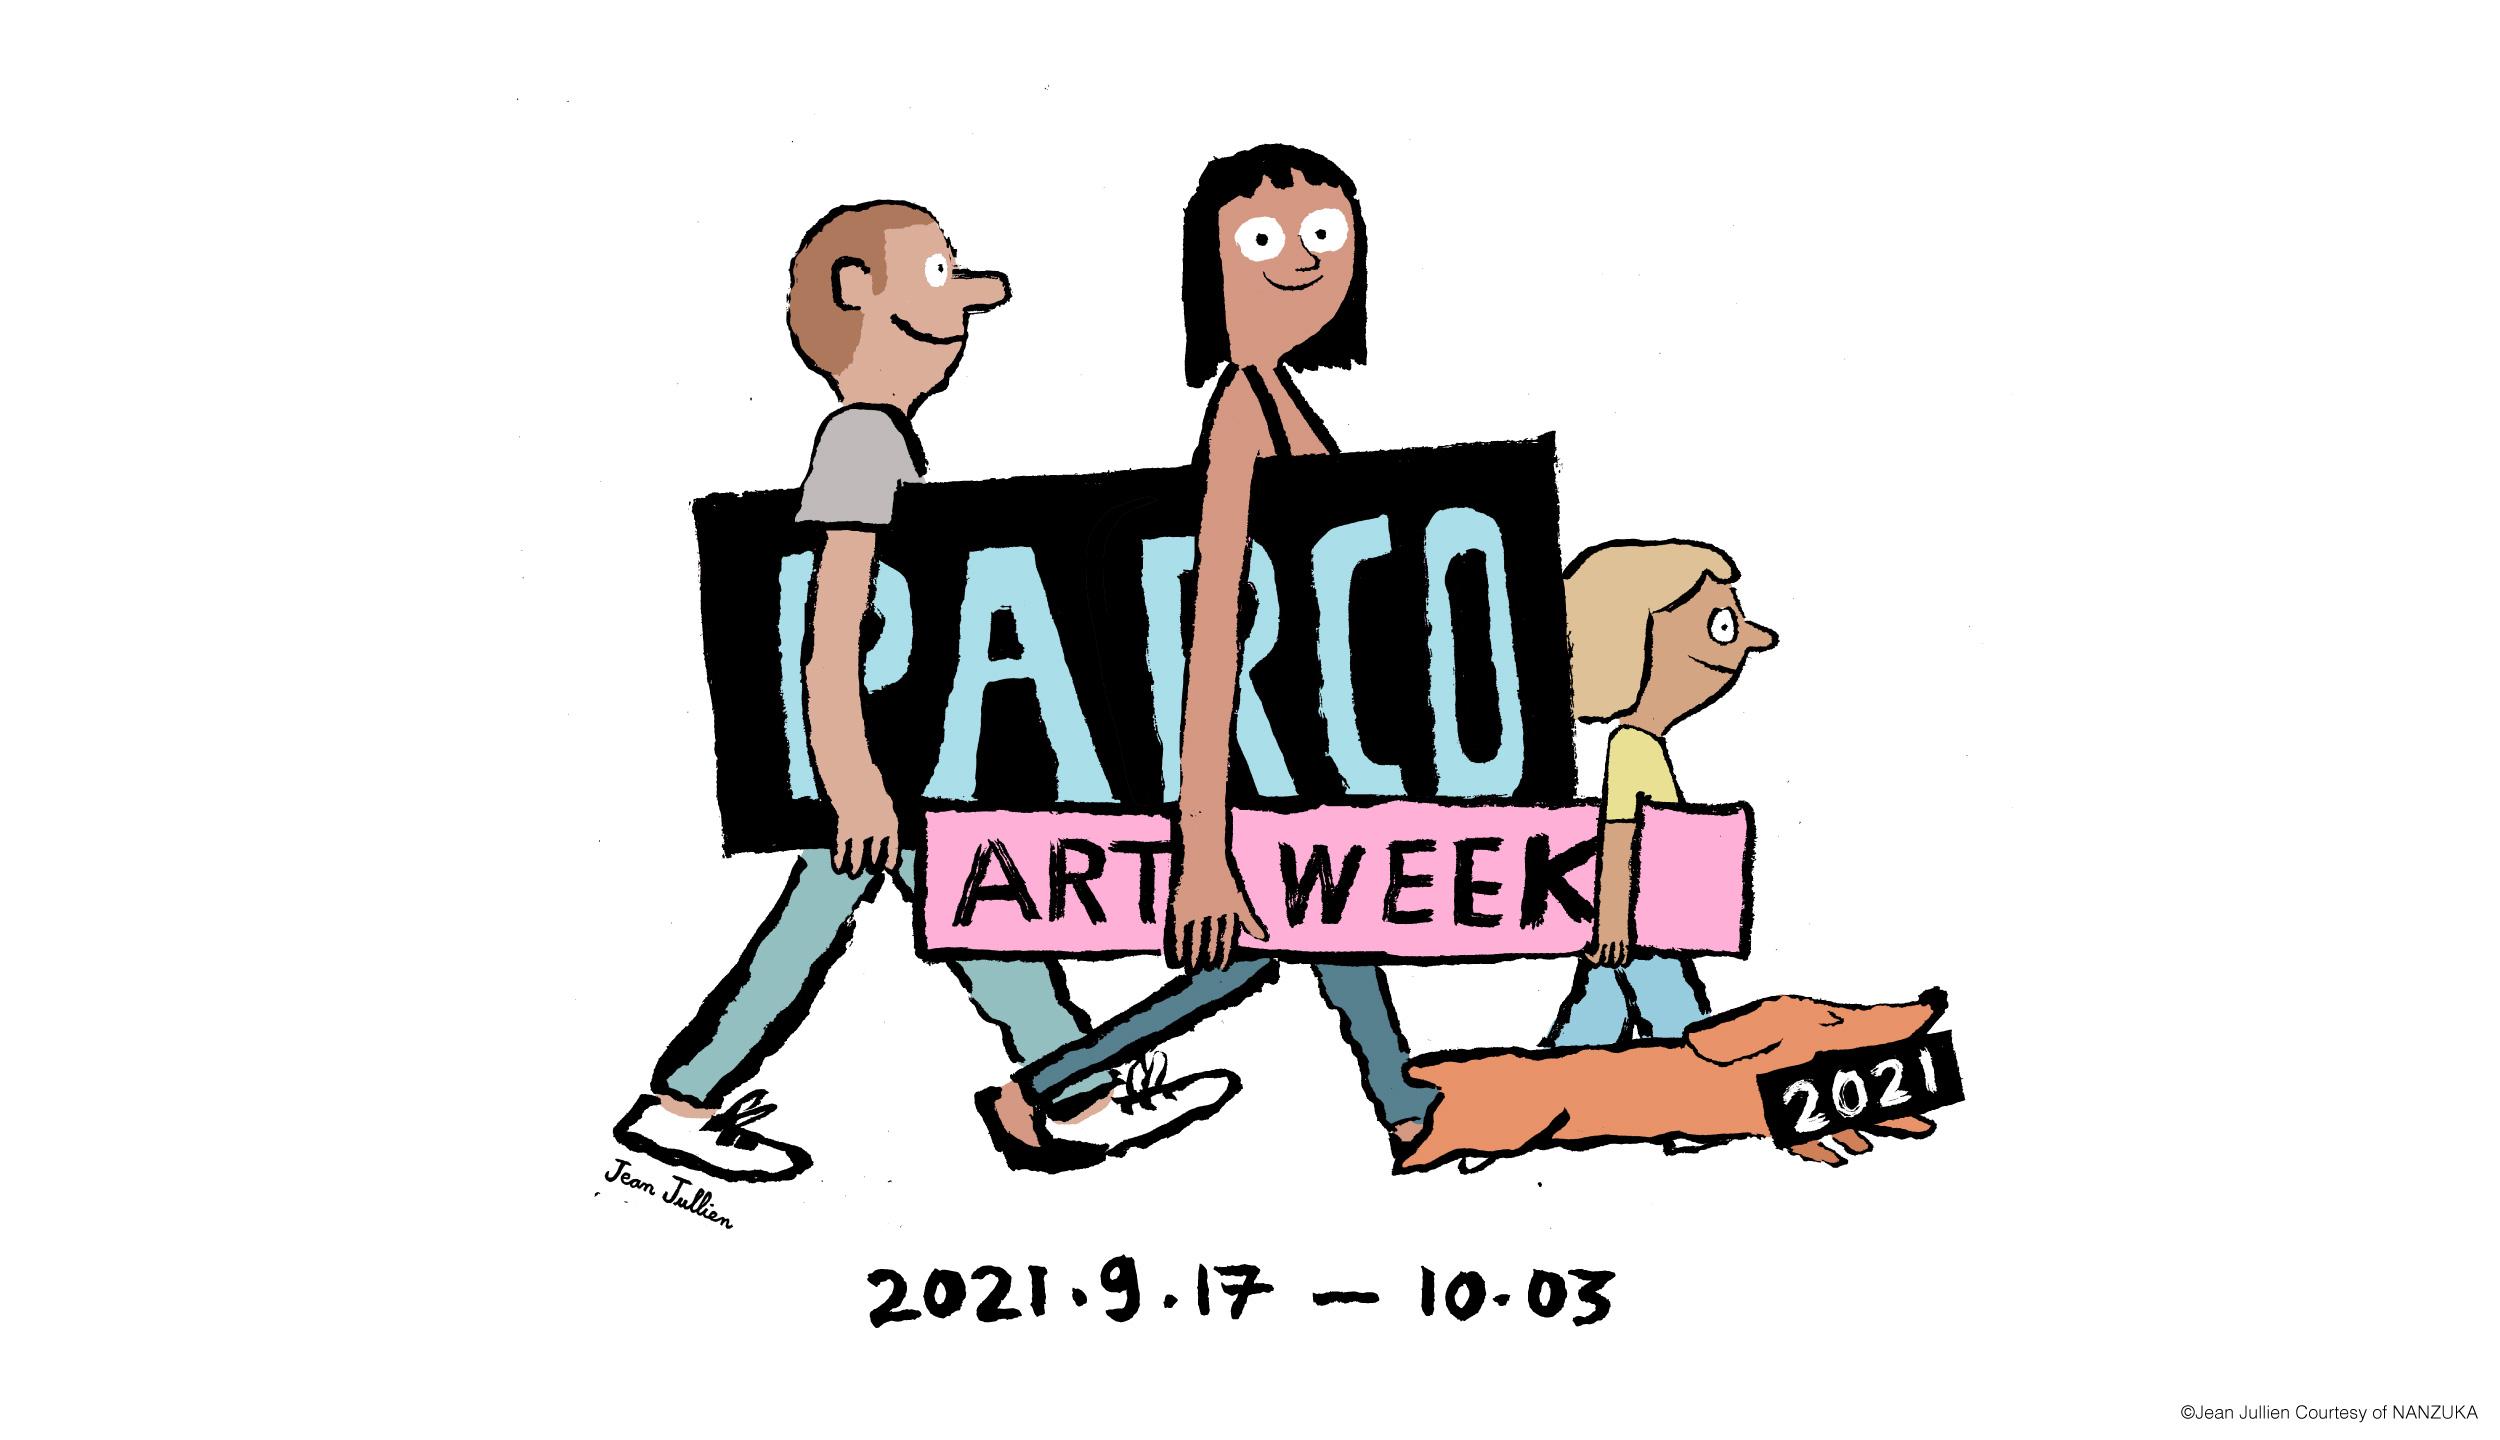 SHIBUYA PARCO ART WEEK 2021今年も 全館でアート企画多彩に